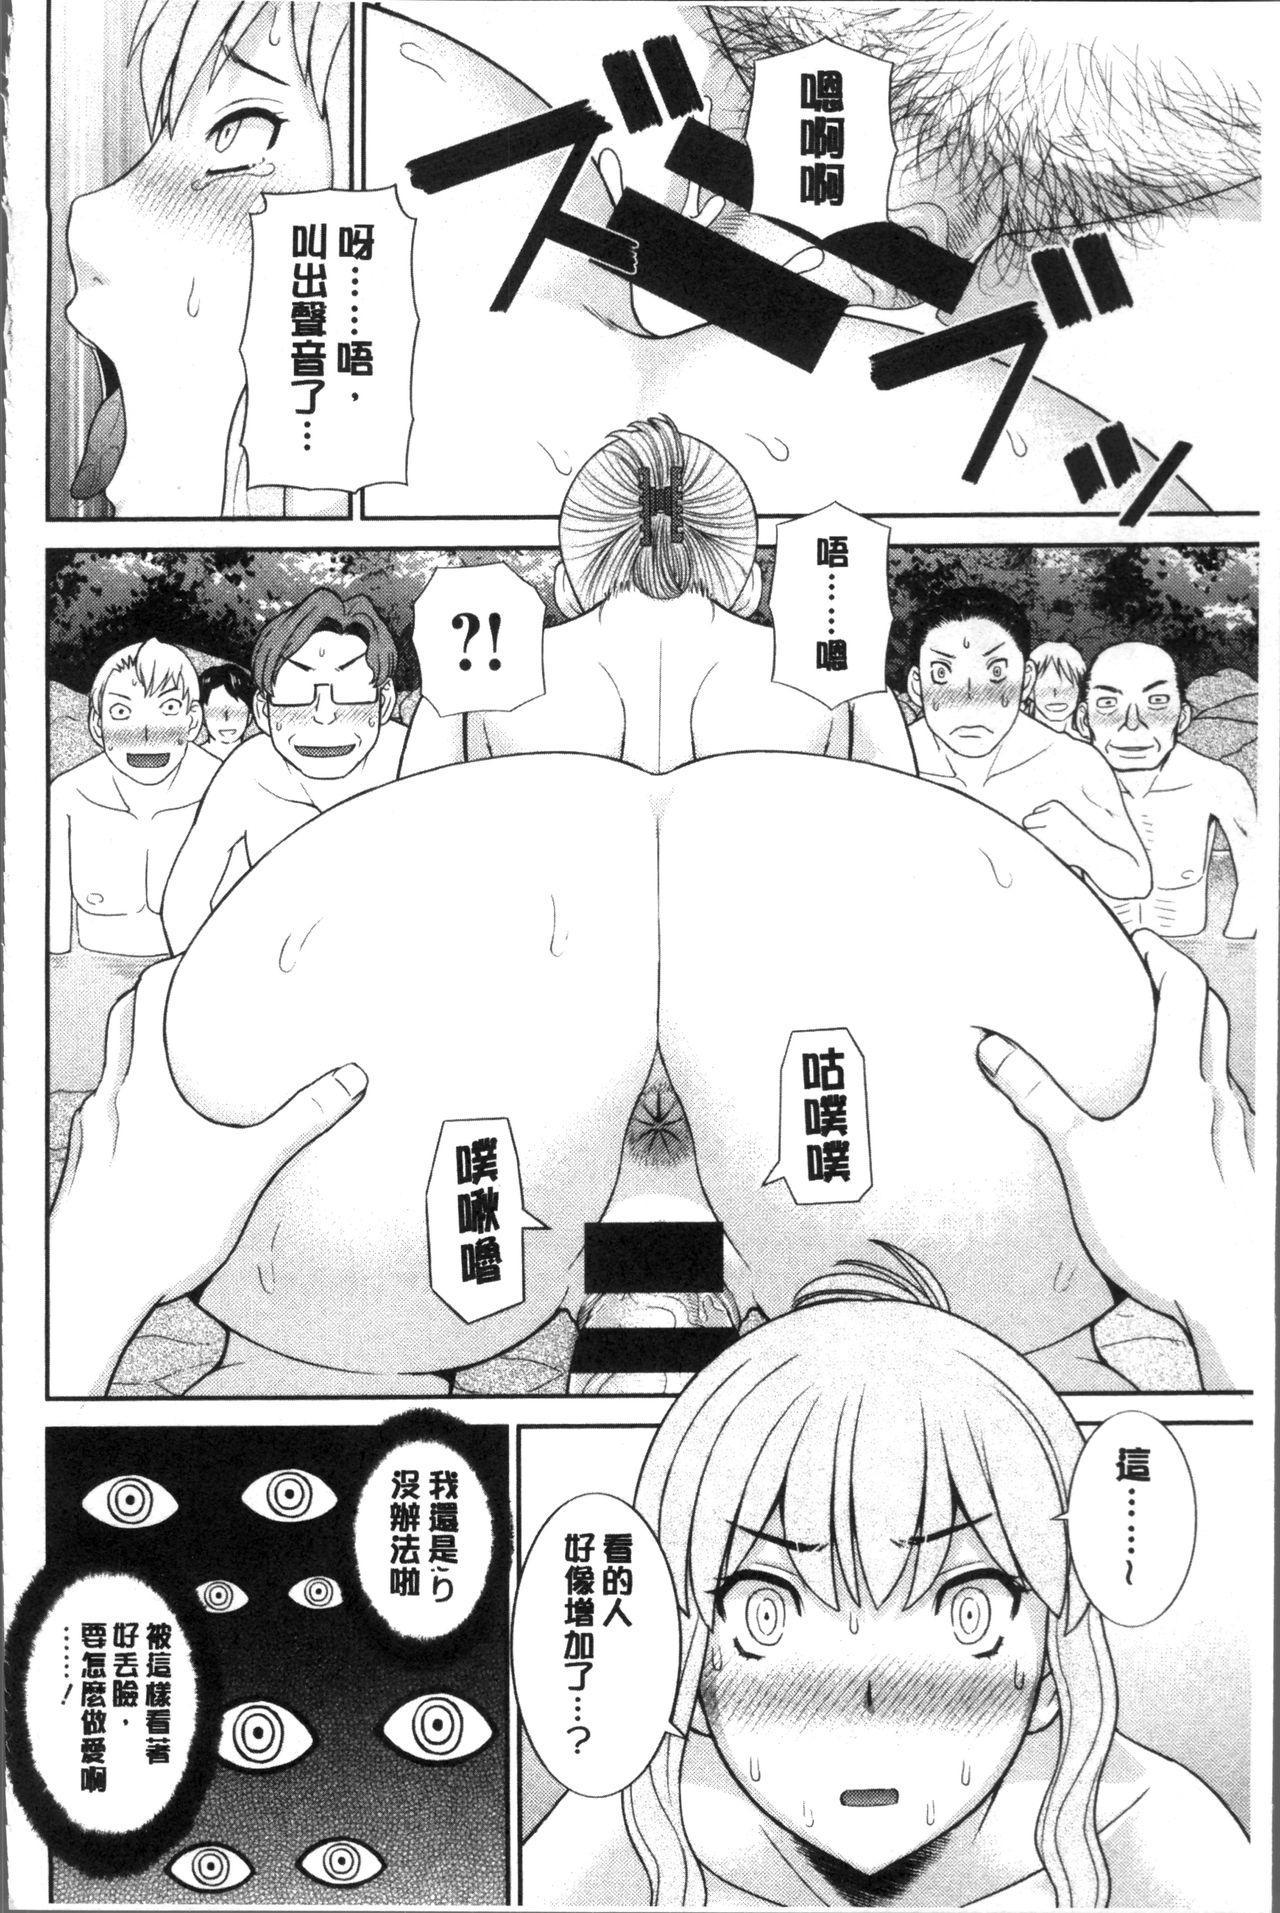 [Kawamori Misaki] Innyuu Shufu no Futei Ganbou - Oku-san to Kanojo to 2 | 淫乳主婦的不貞願望 和人妻也和女友❤2 [Chinese] 89